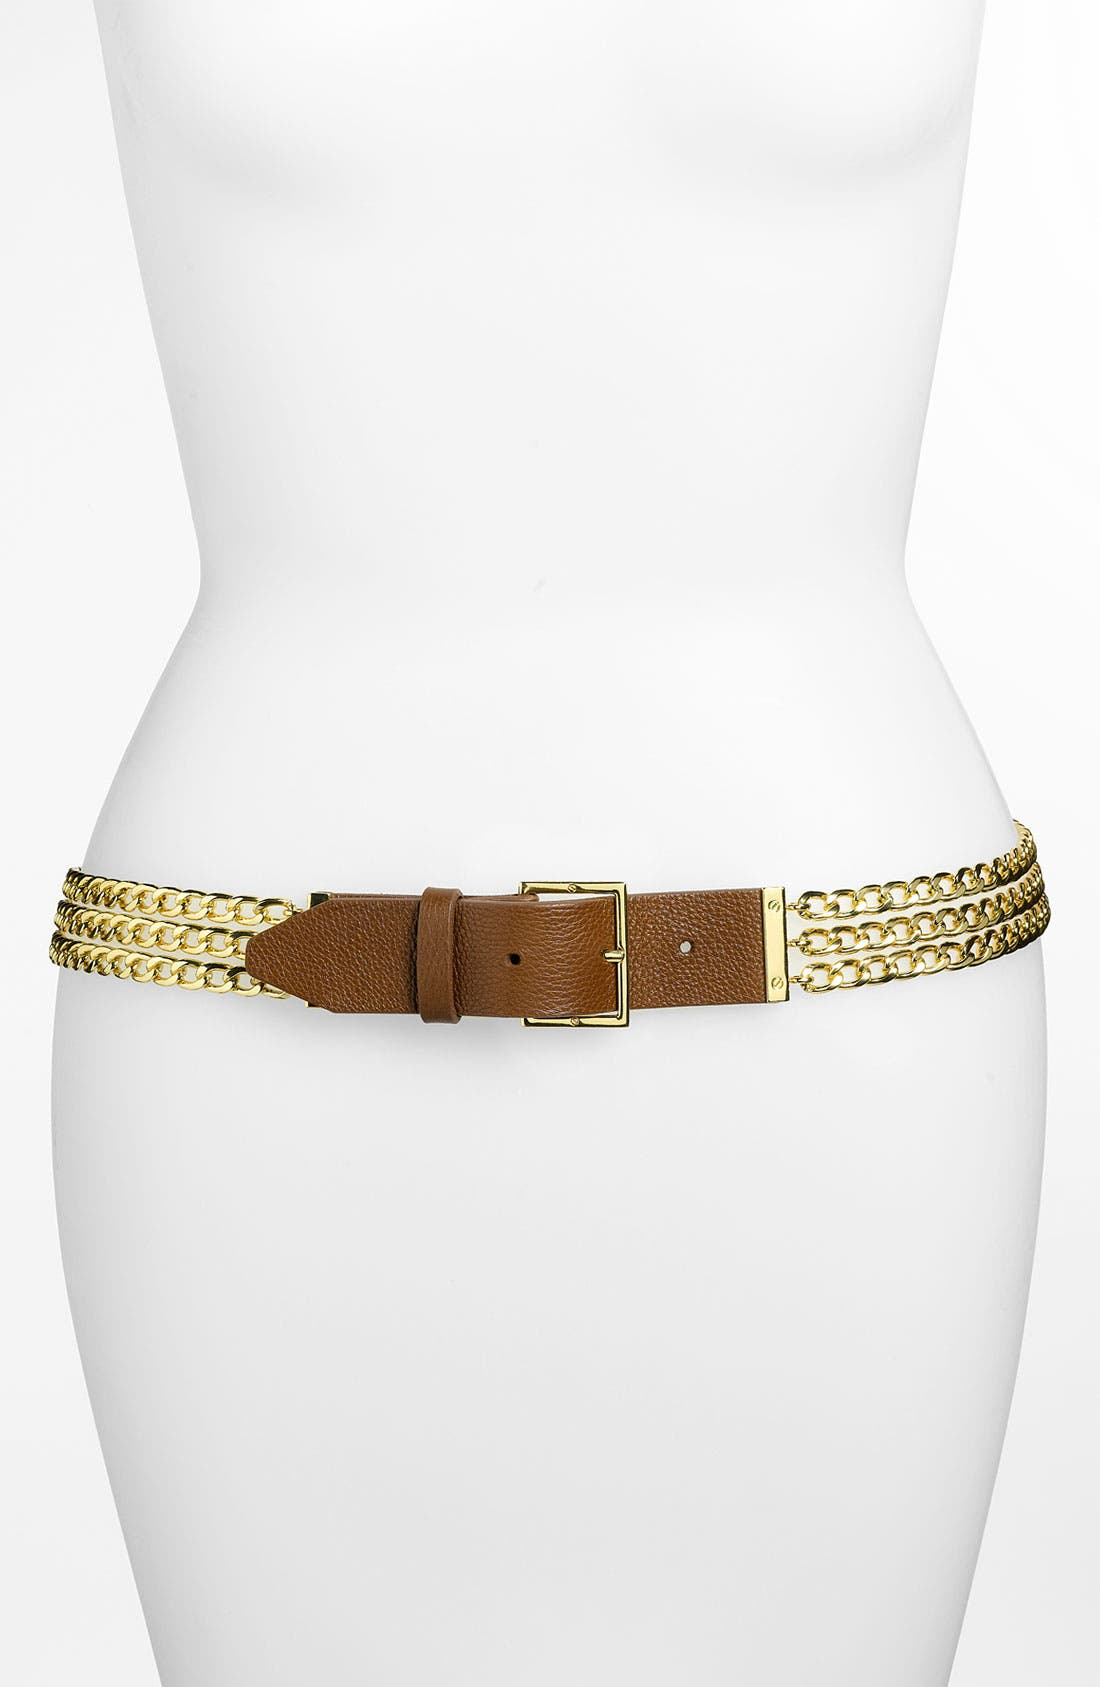 Main Image - Tory Burch Chain Belt